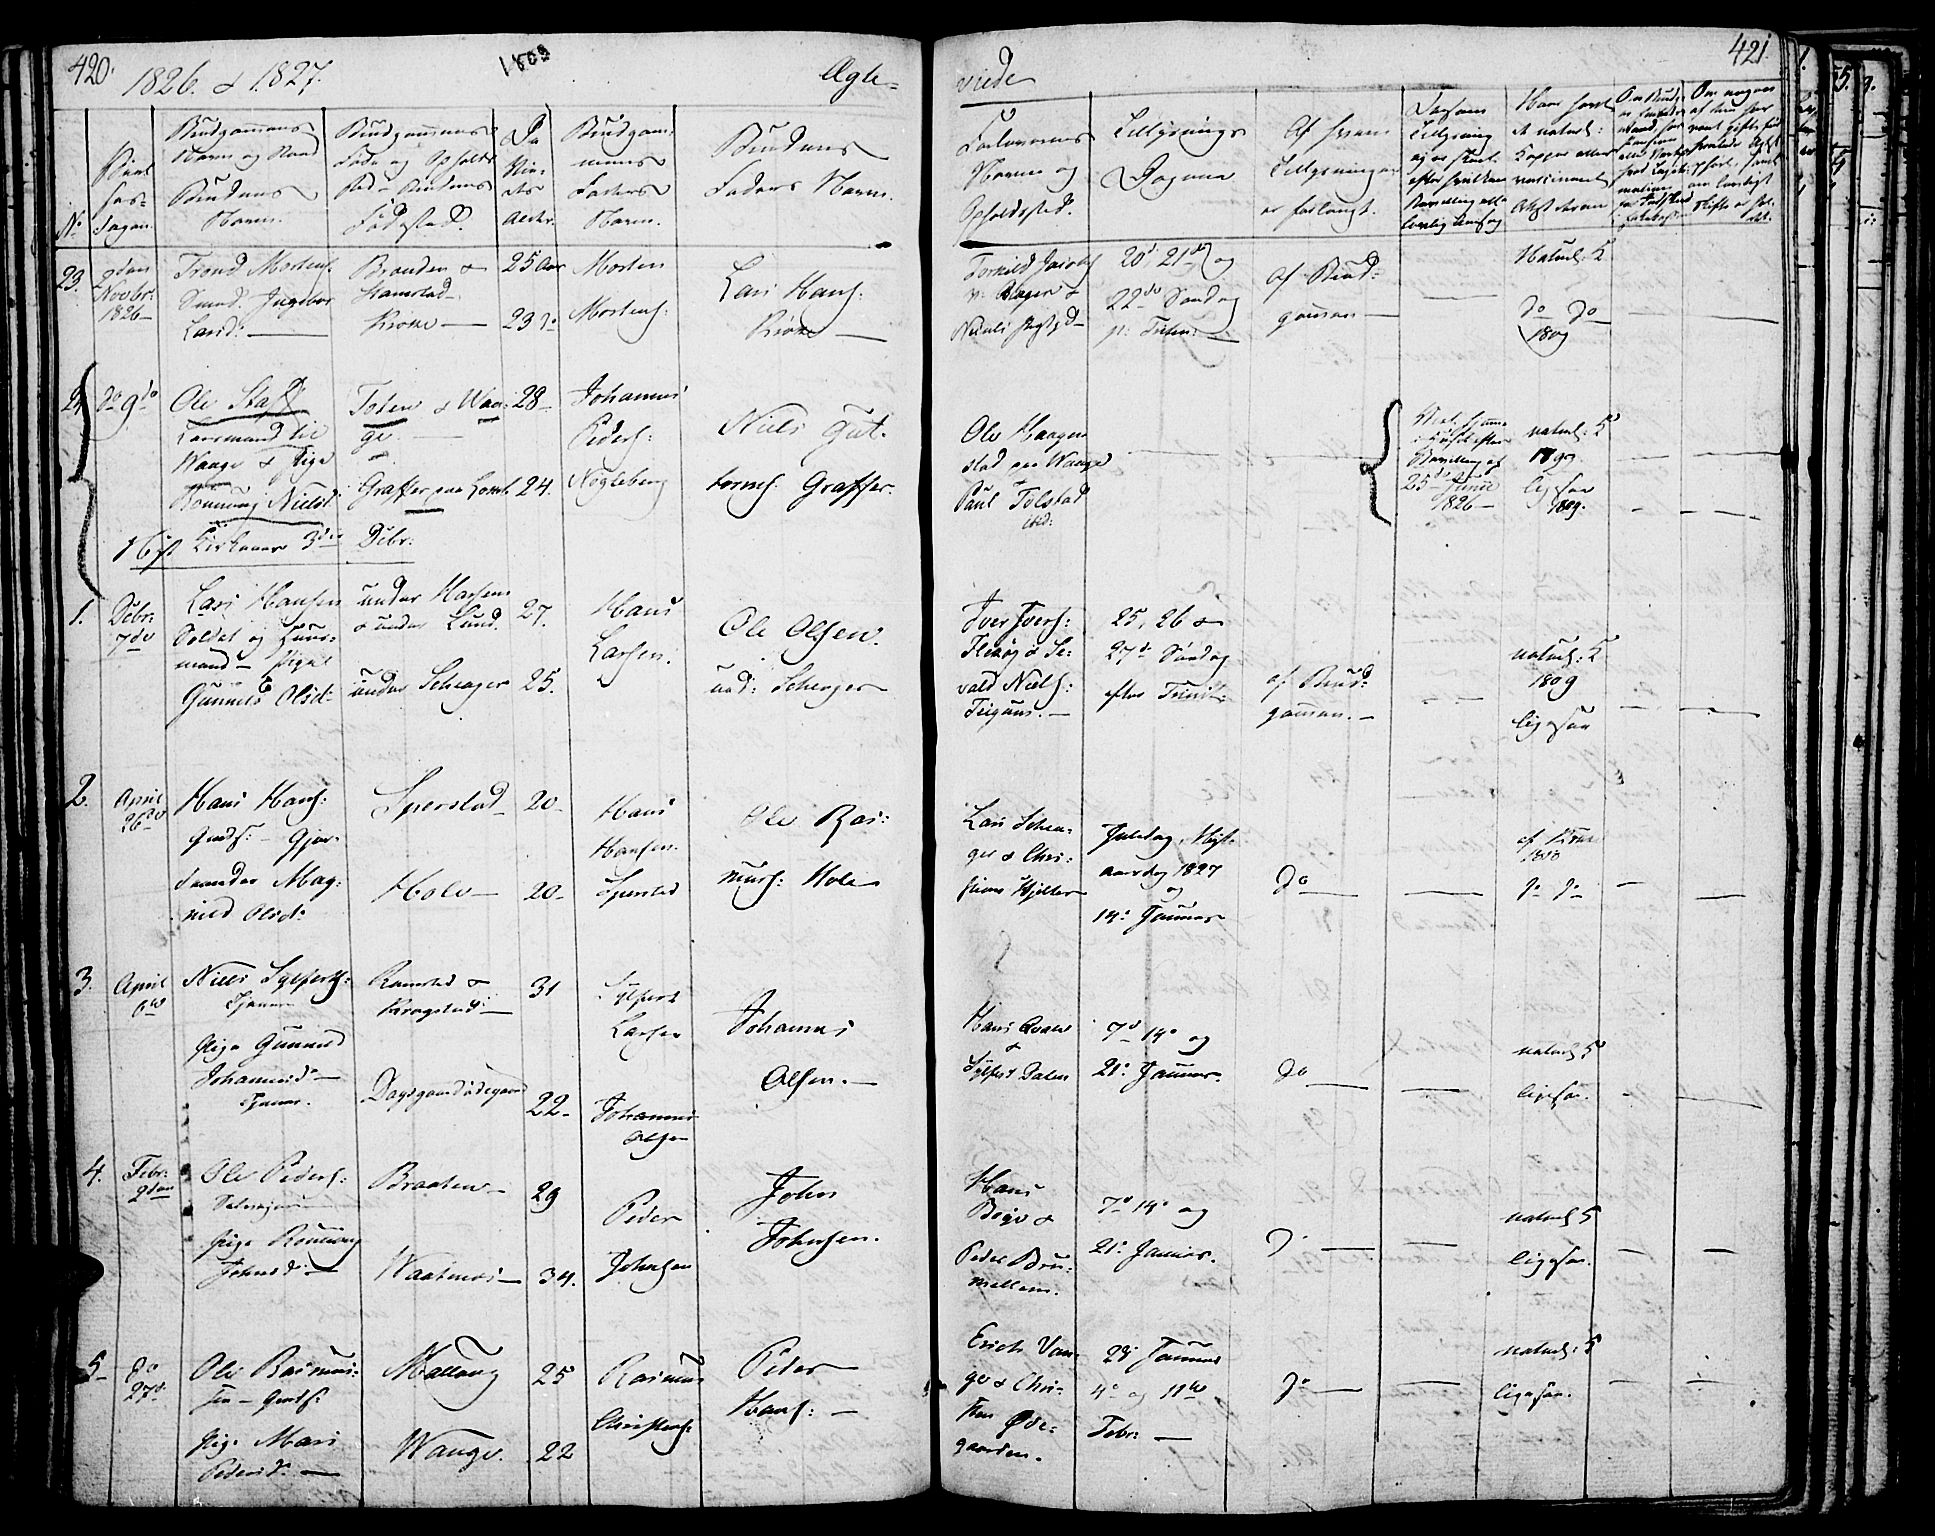 SAH, Lom prestekontor, K/L0005: Parish register (official) no. 5, 1825-1837, p. 420-421